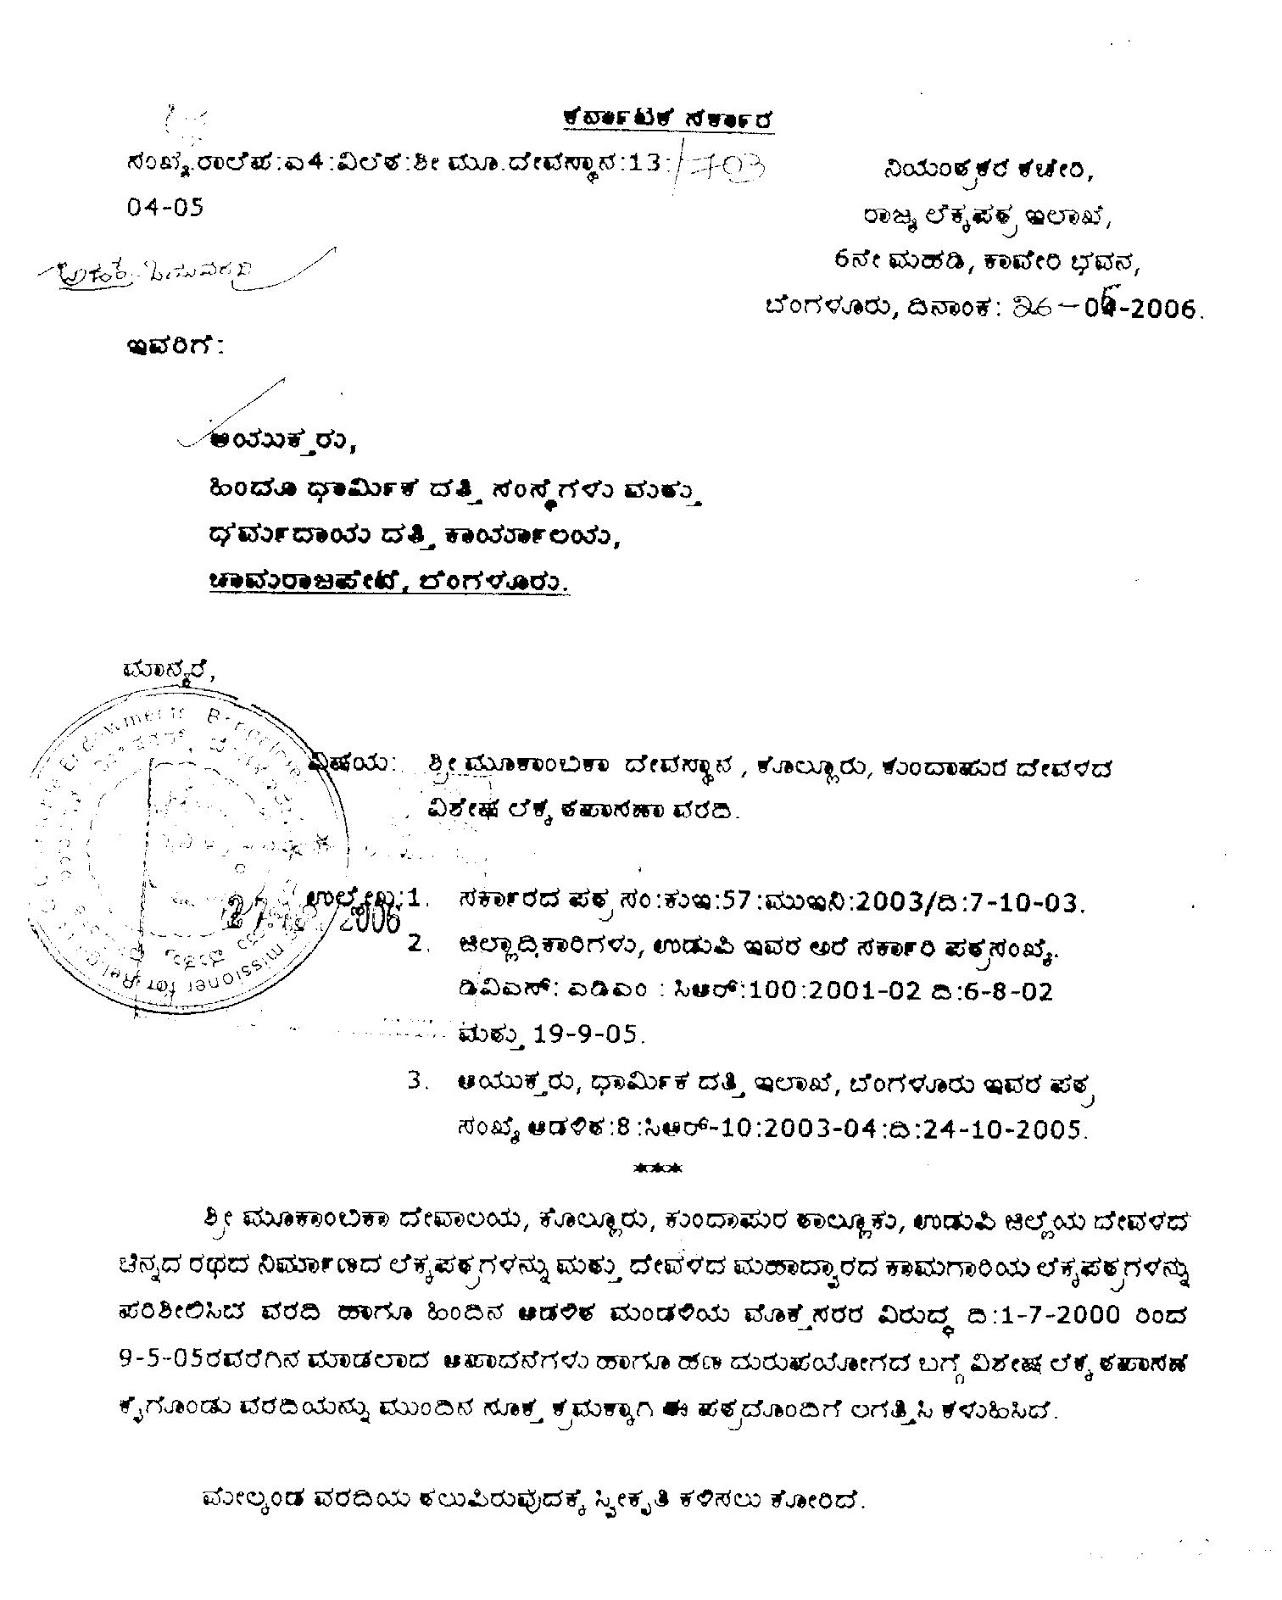 Sample Academic Application Letter Alamy